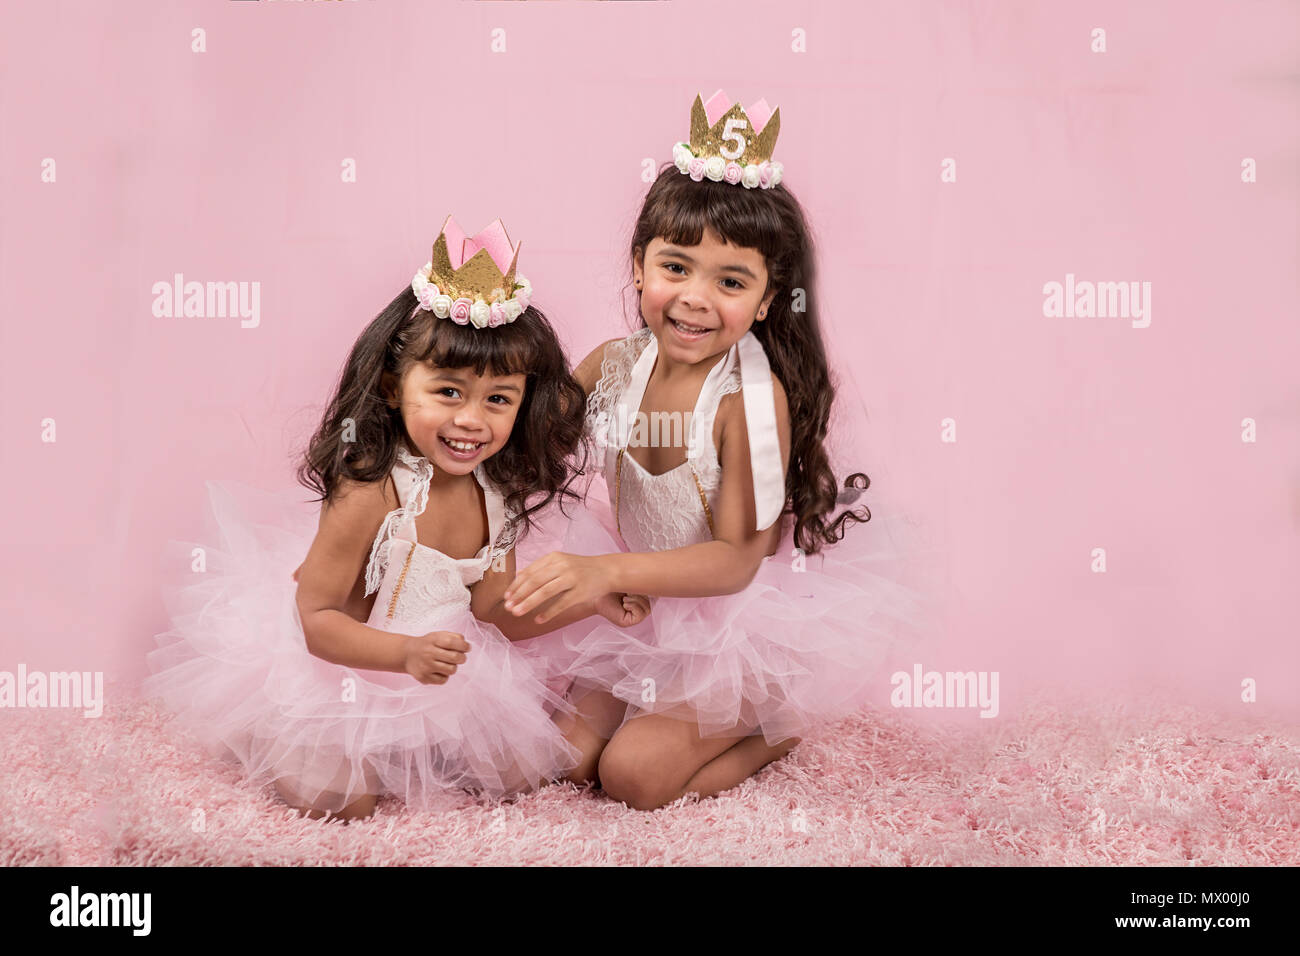 Playing Princesses Imágenes De Stock & Playing Princesses Fotos De ...